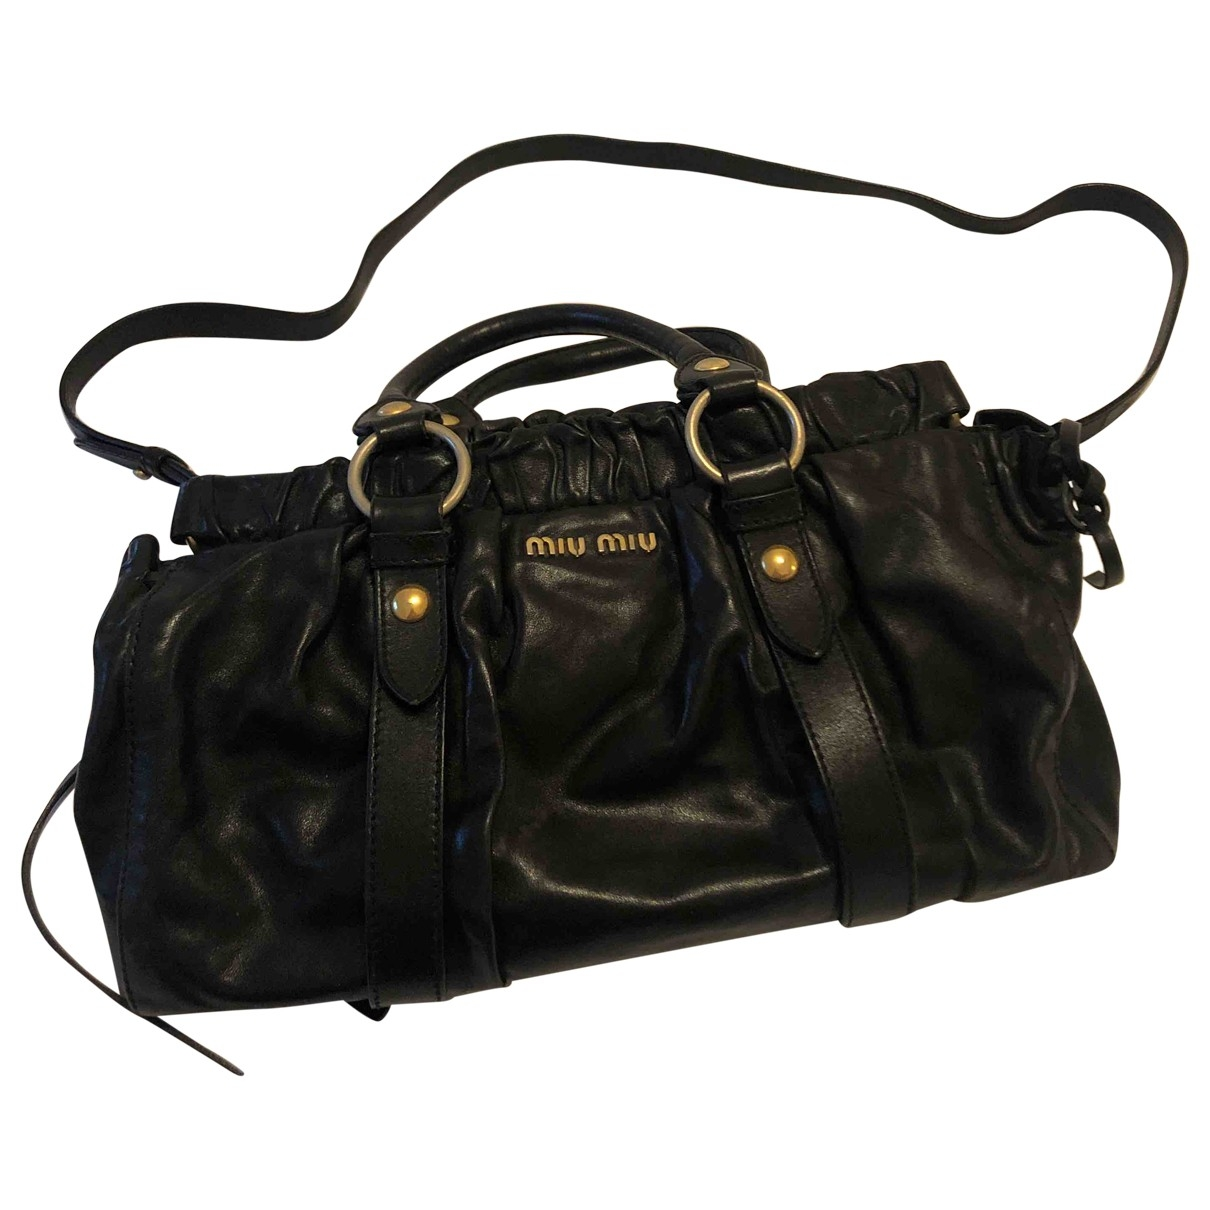 Miu Miu Bow bag Handtasche in  Schwarz Leder